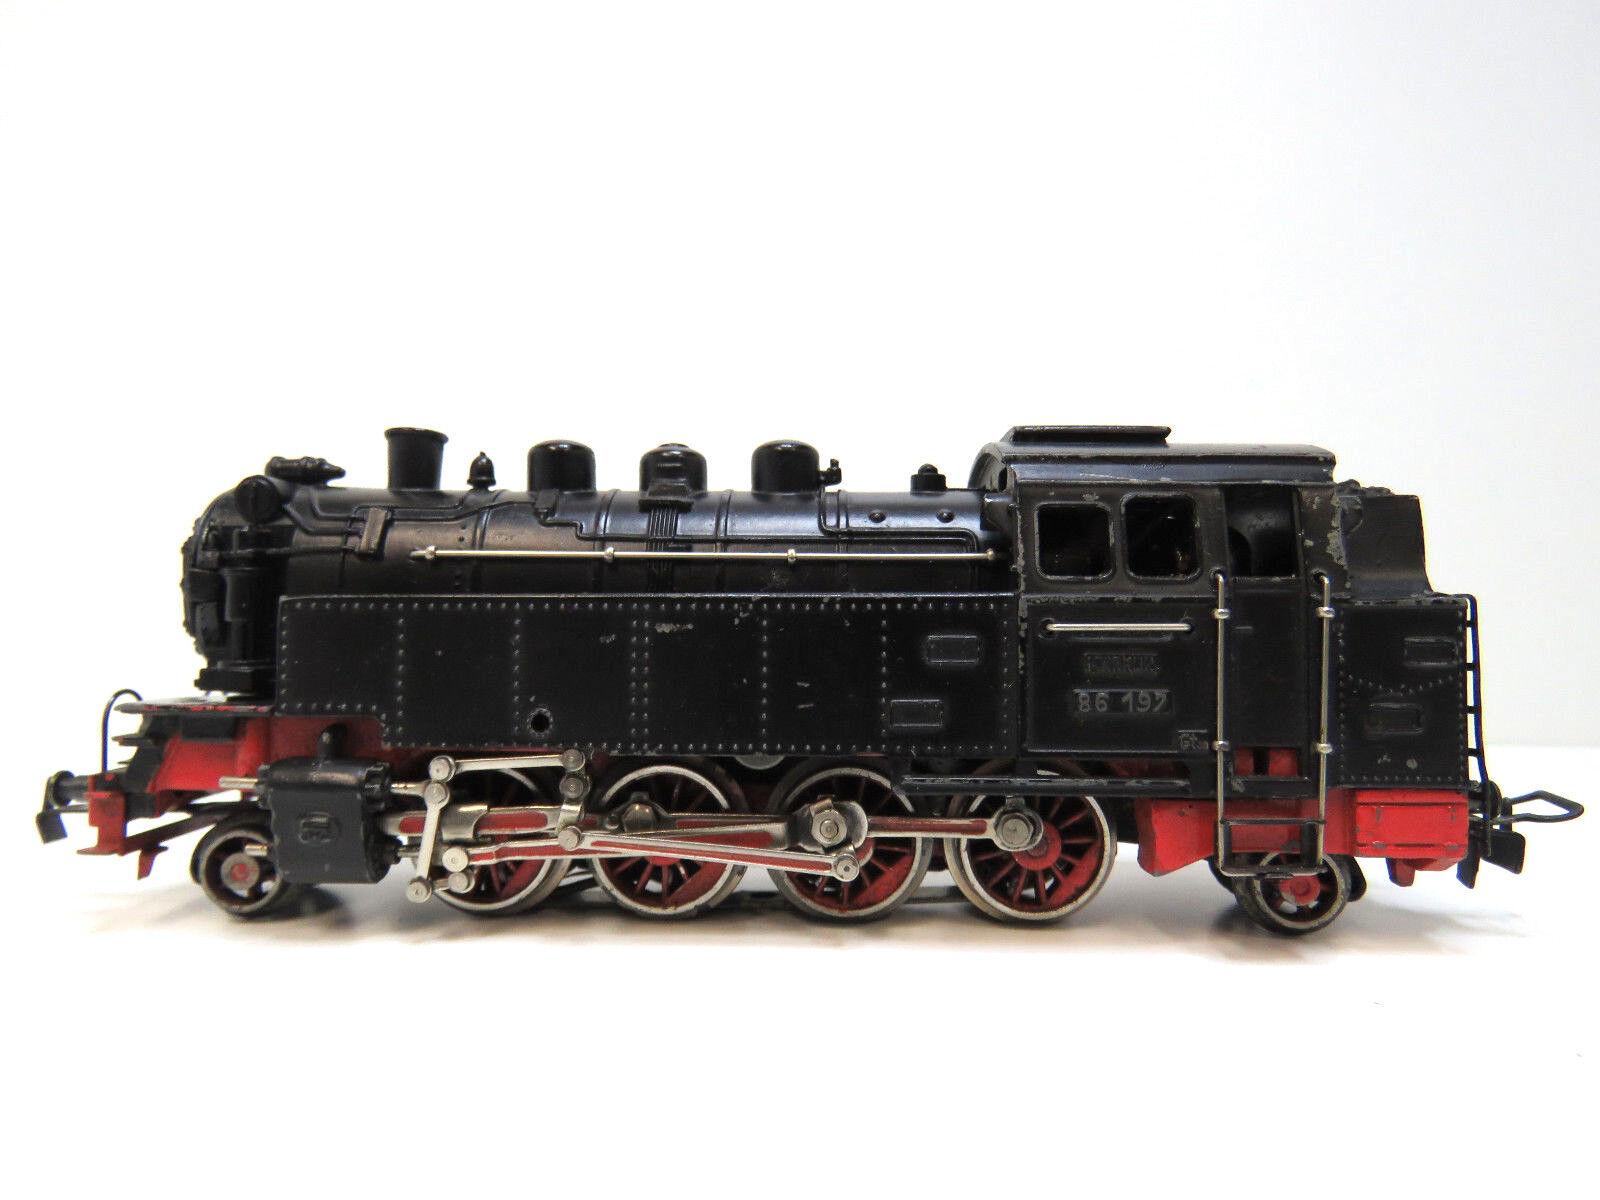 Locomotiva BR 86 197 delle DB, Epoca III,  , TT 800, CALDAIA TP 800, CARTONCINO 3096,kv